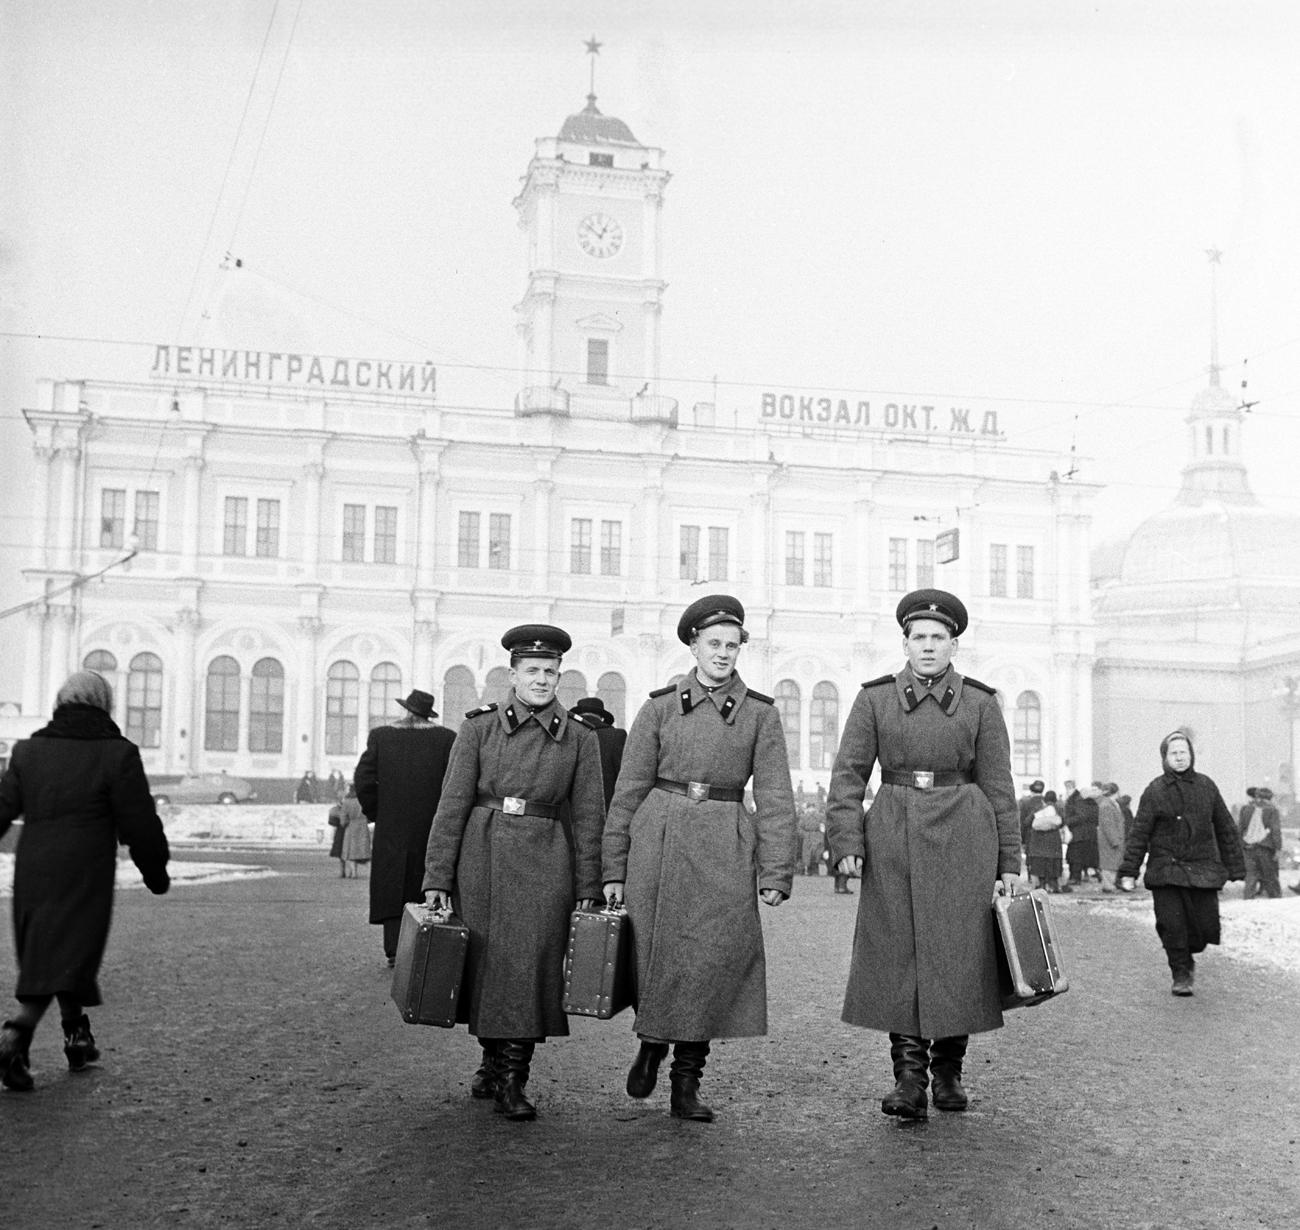 La stazione di Leningrado. Fonte: Chernov / RIA Novosti